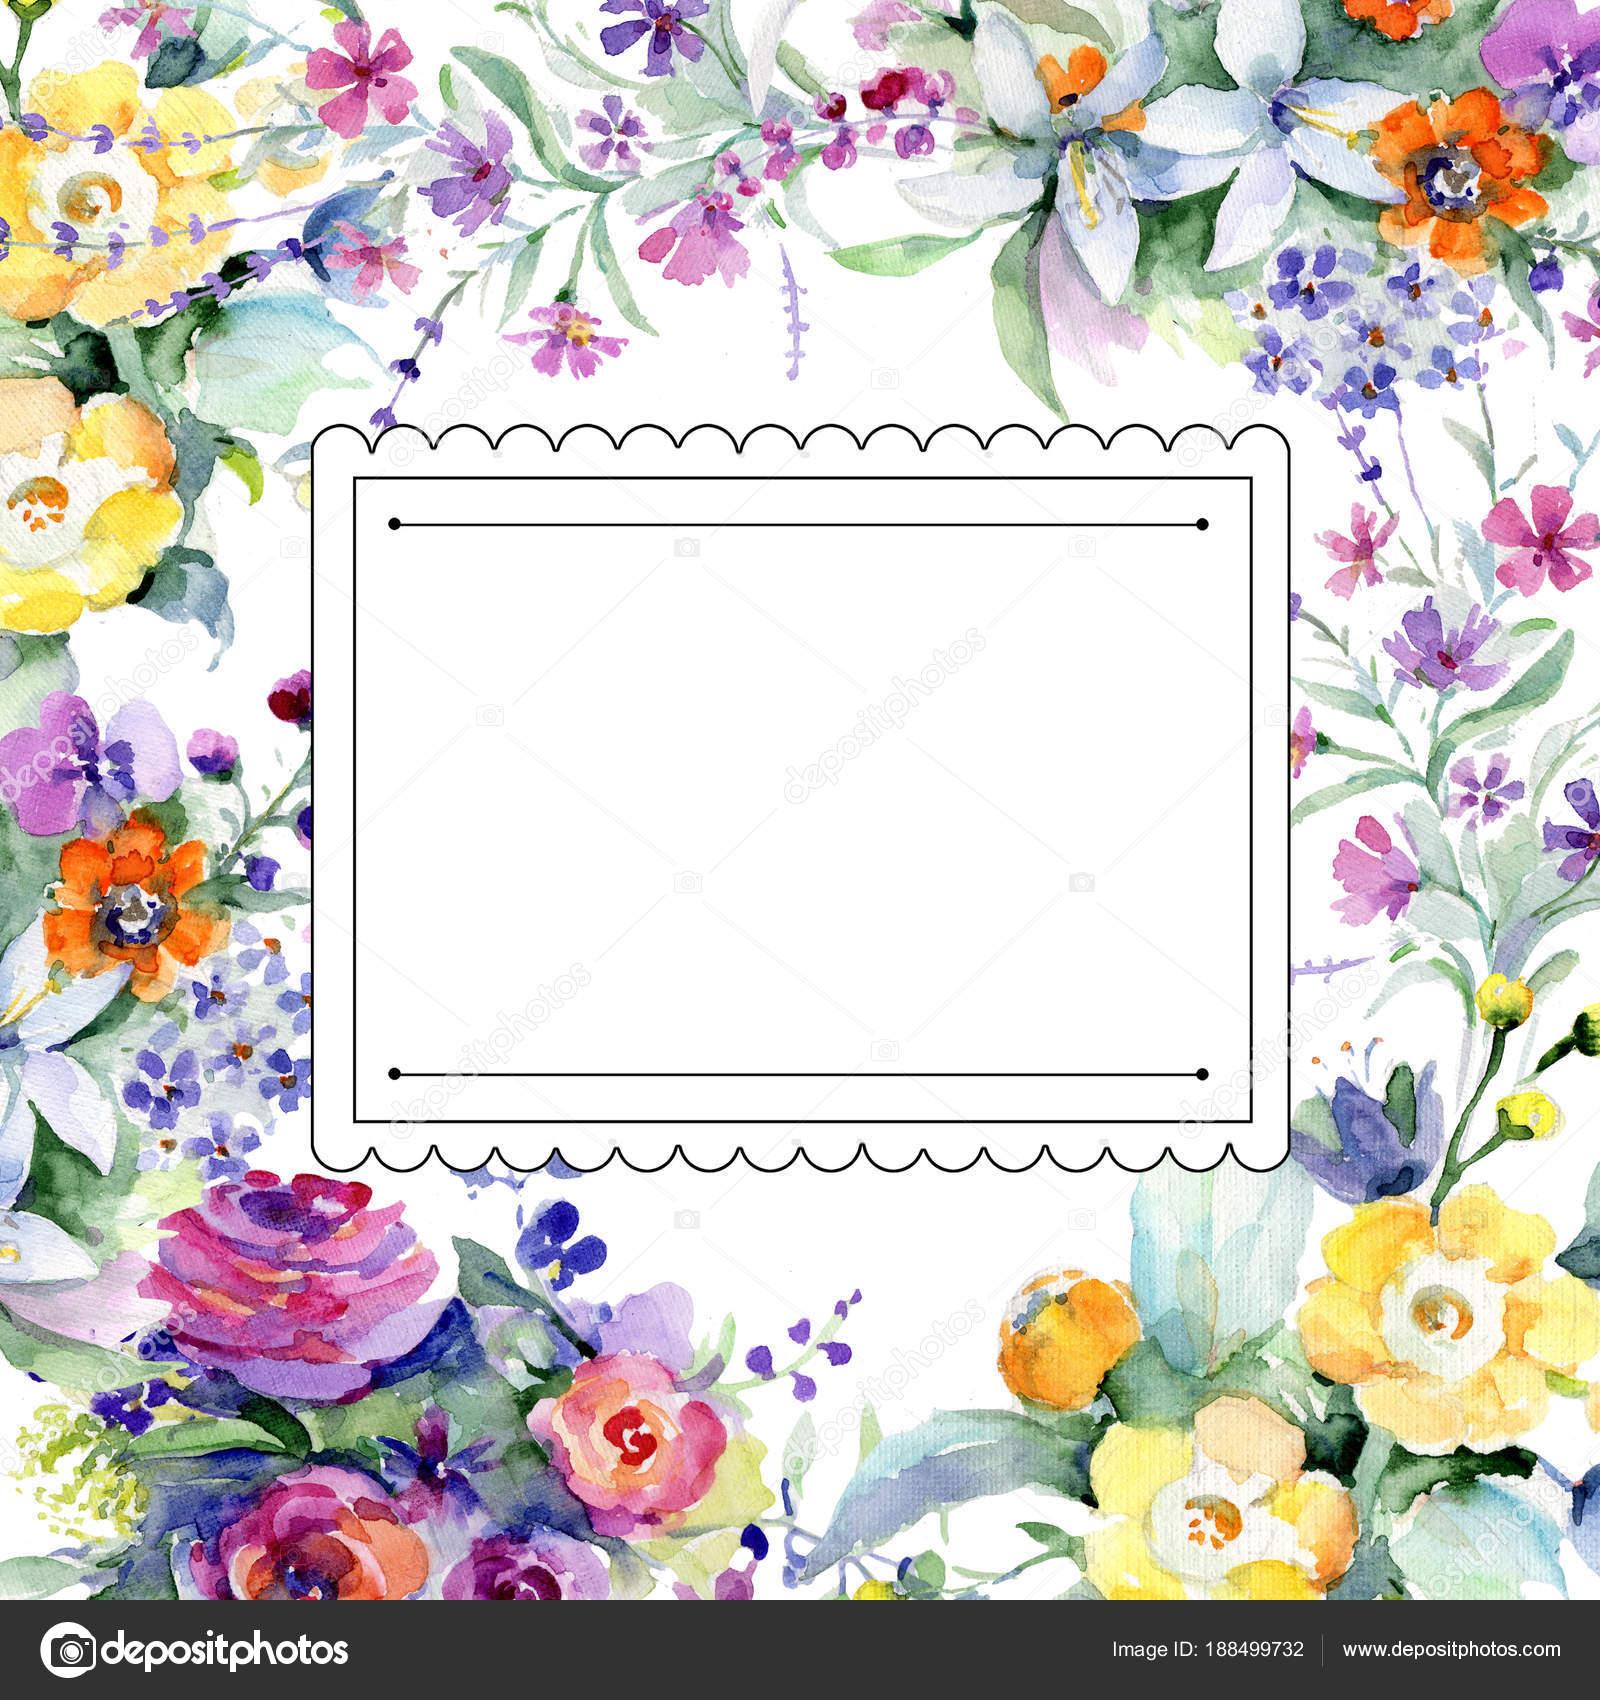 Blumenstrauß Blumenrahmen im Aquarell-Stil — Stockfoto © MyStocks ...